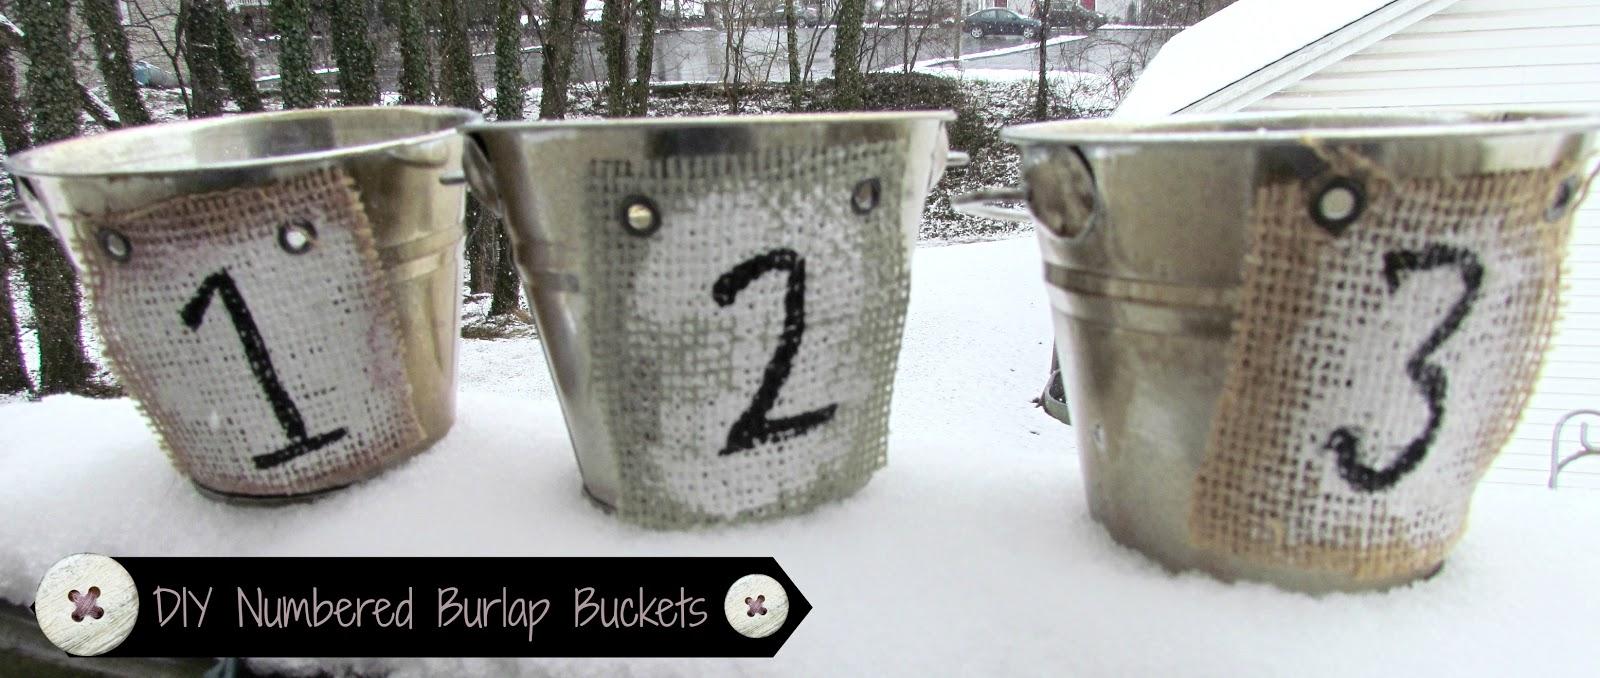 DIY Numbered Burlap Buckets